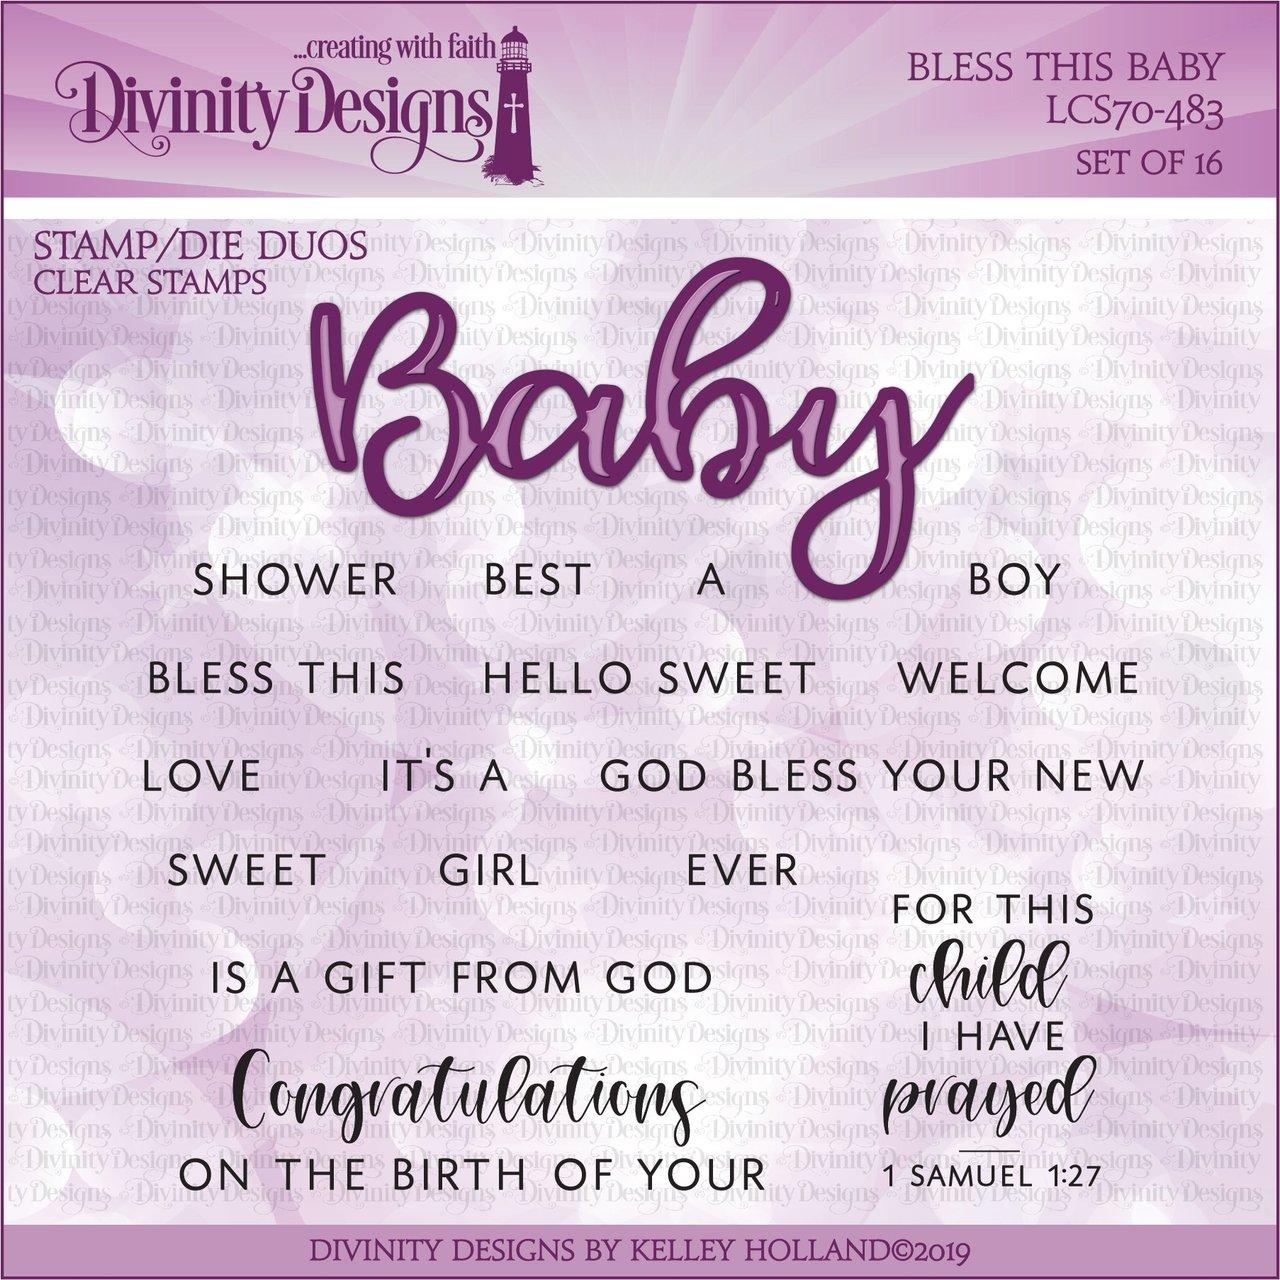 Divinity Designs - Bless This Baby Stamp/Die Set